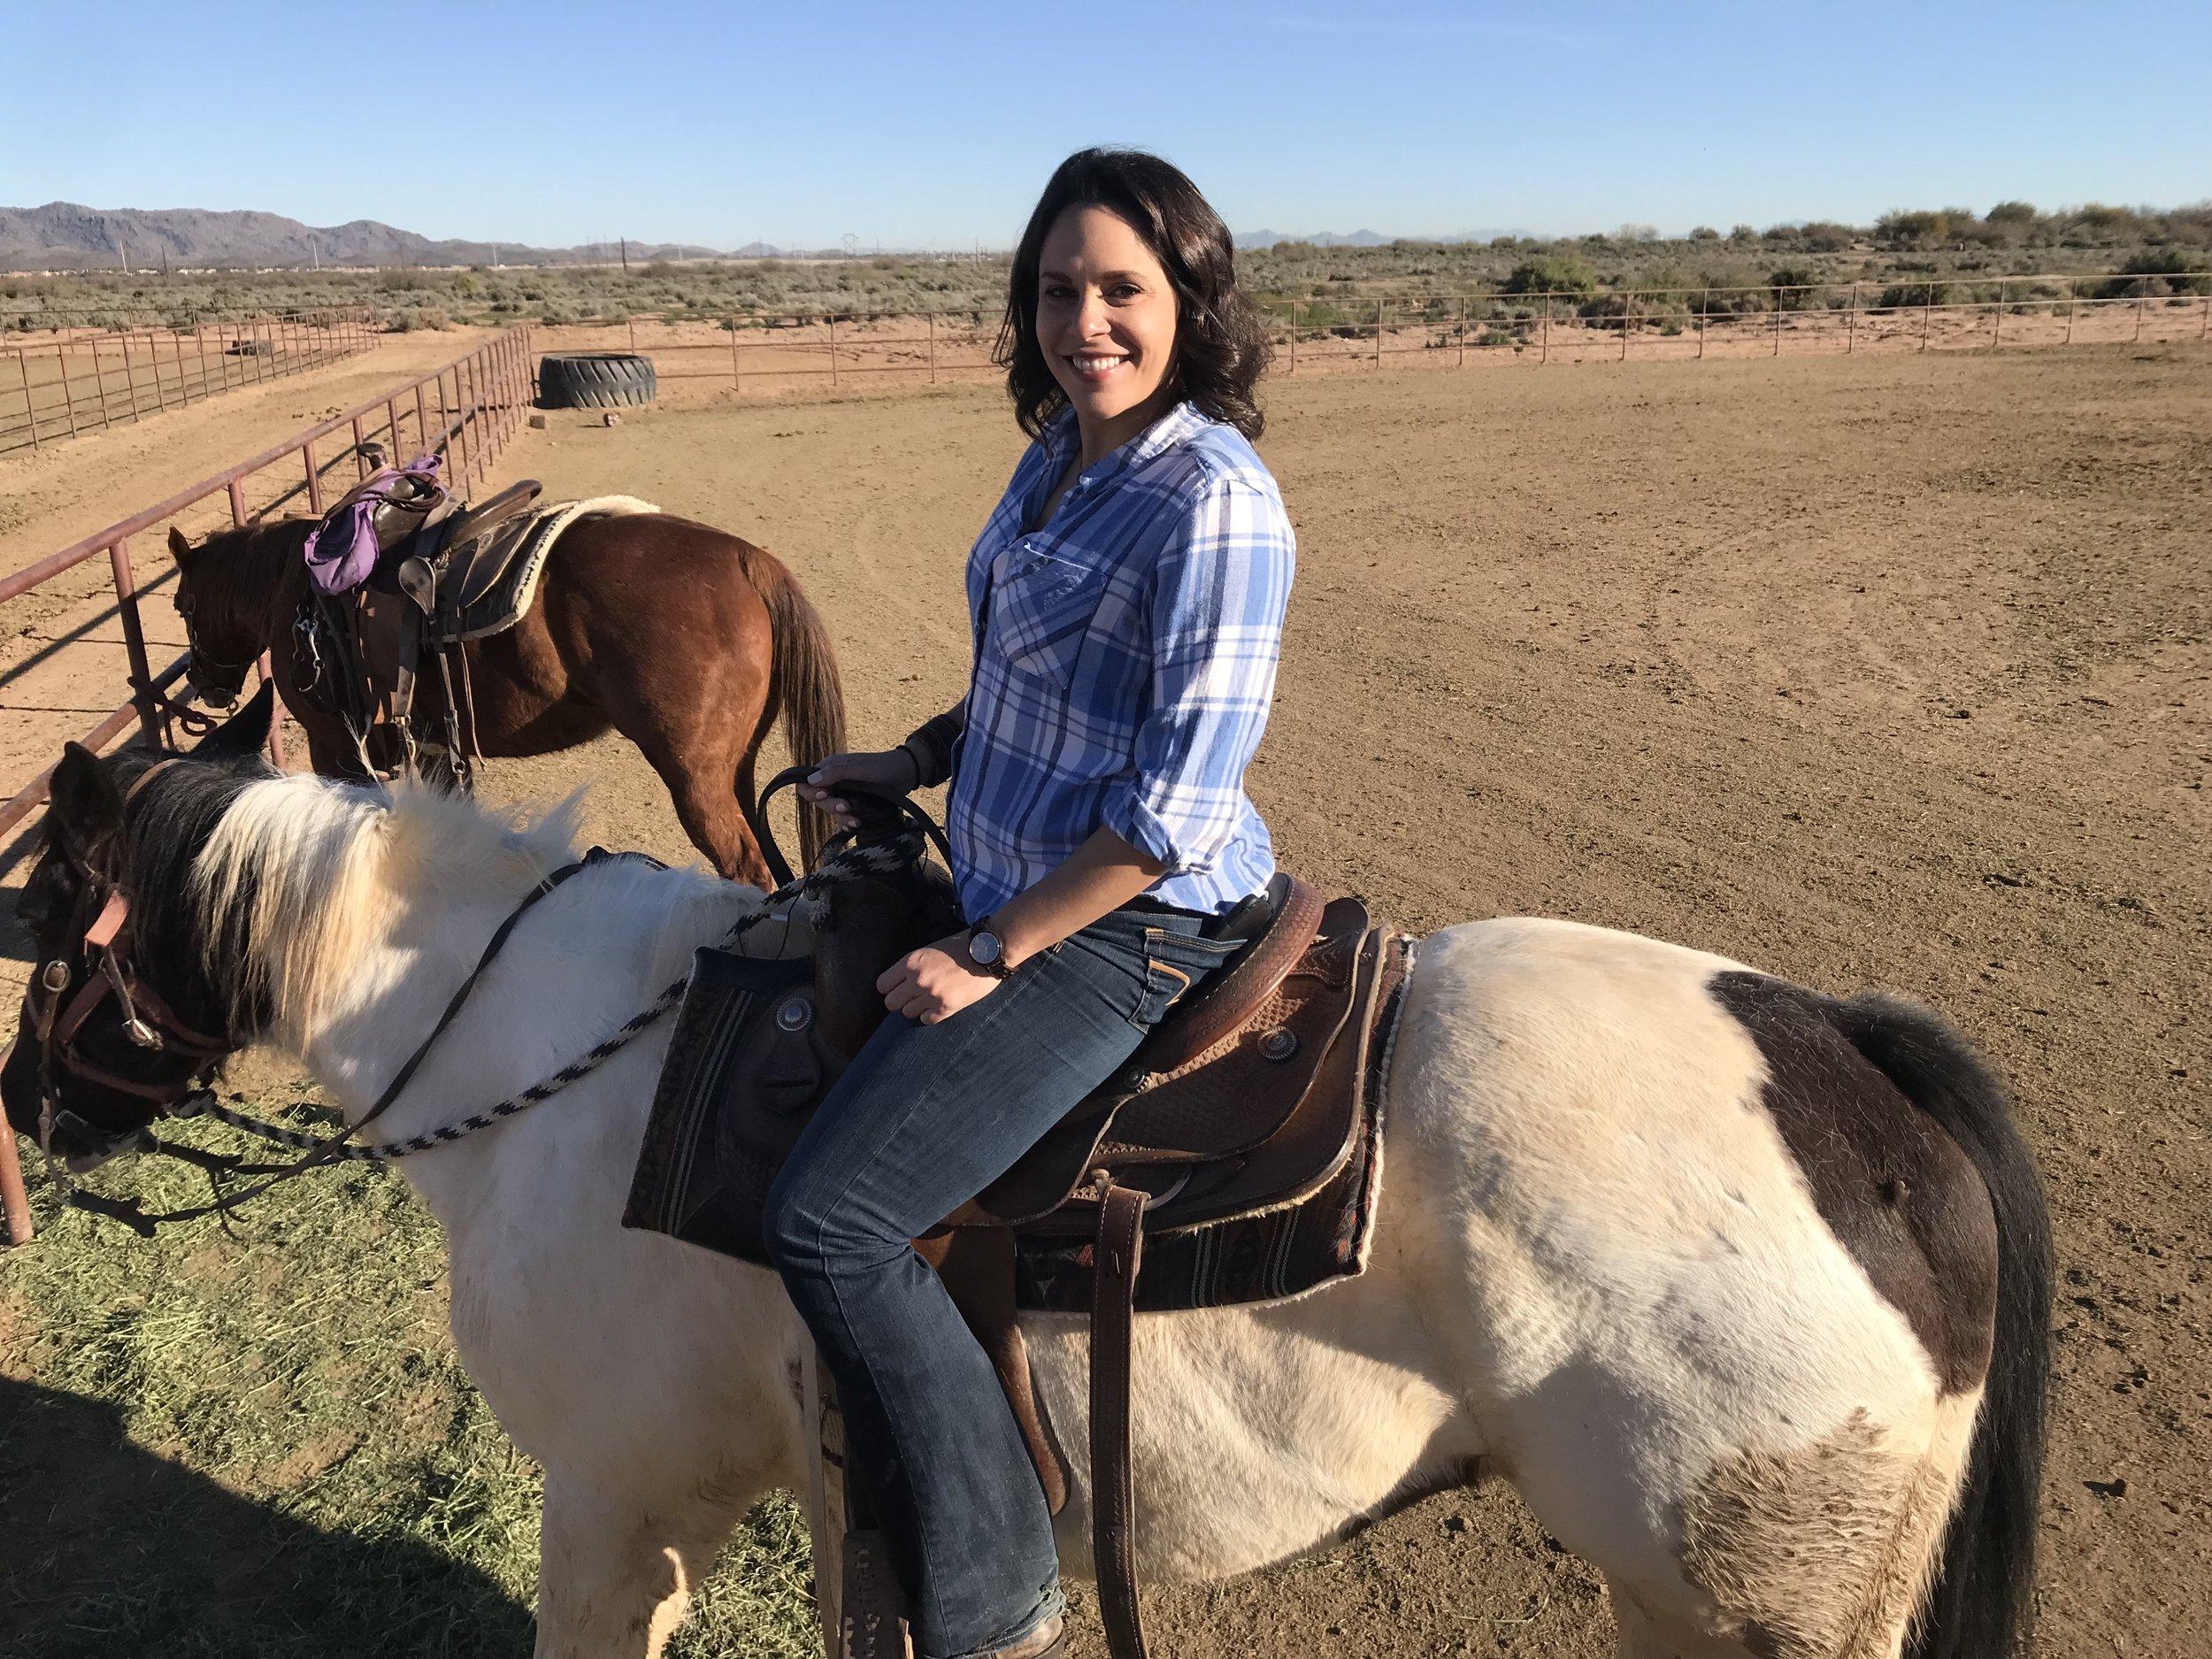 Happiest on horseback